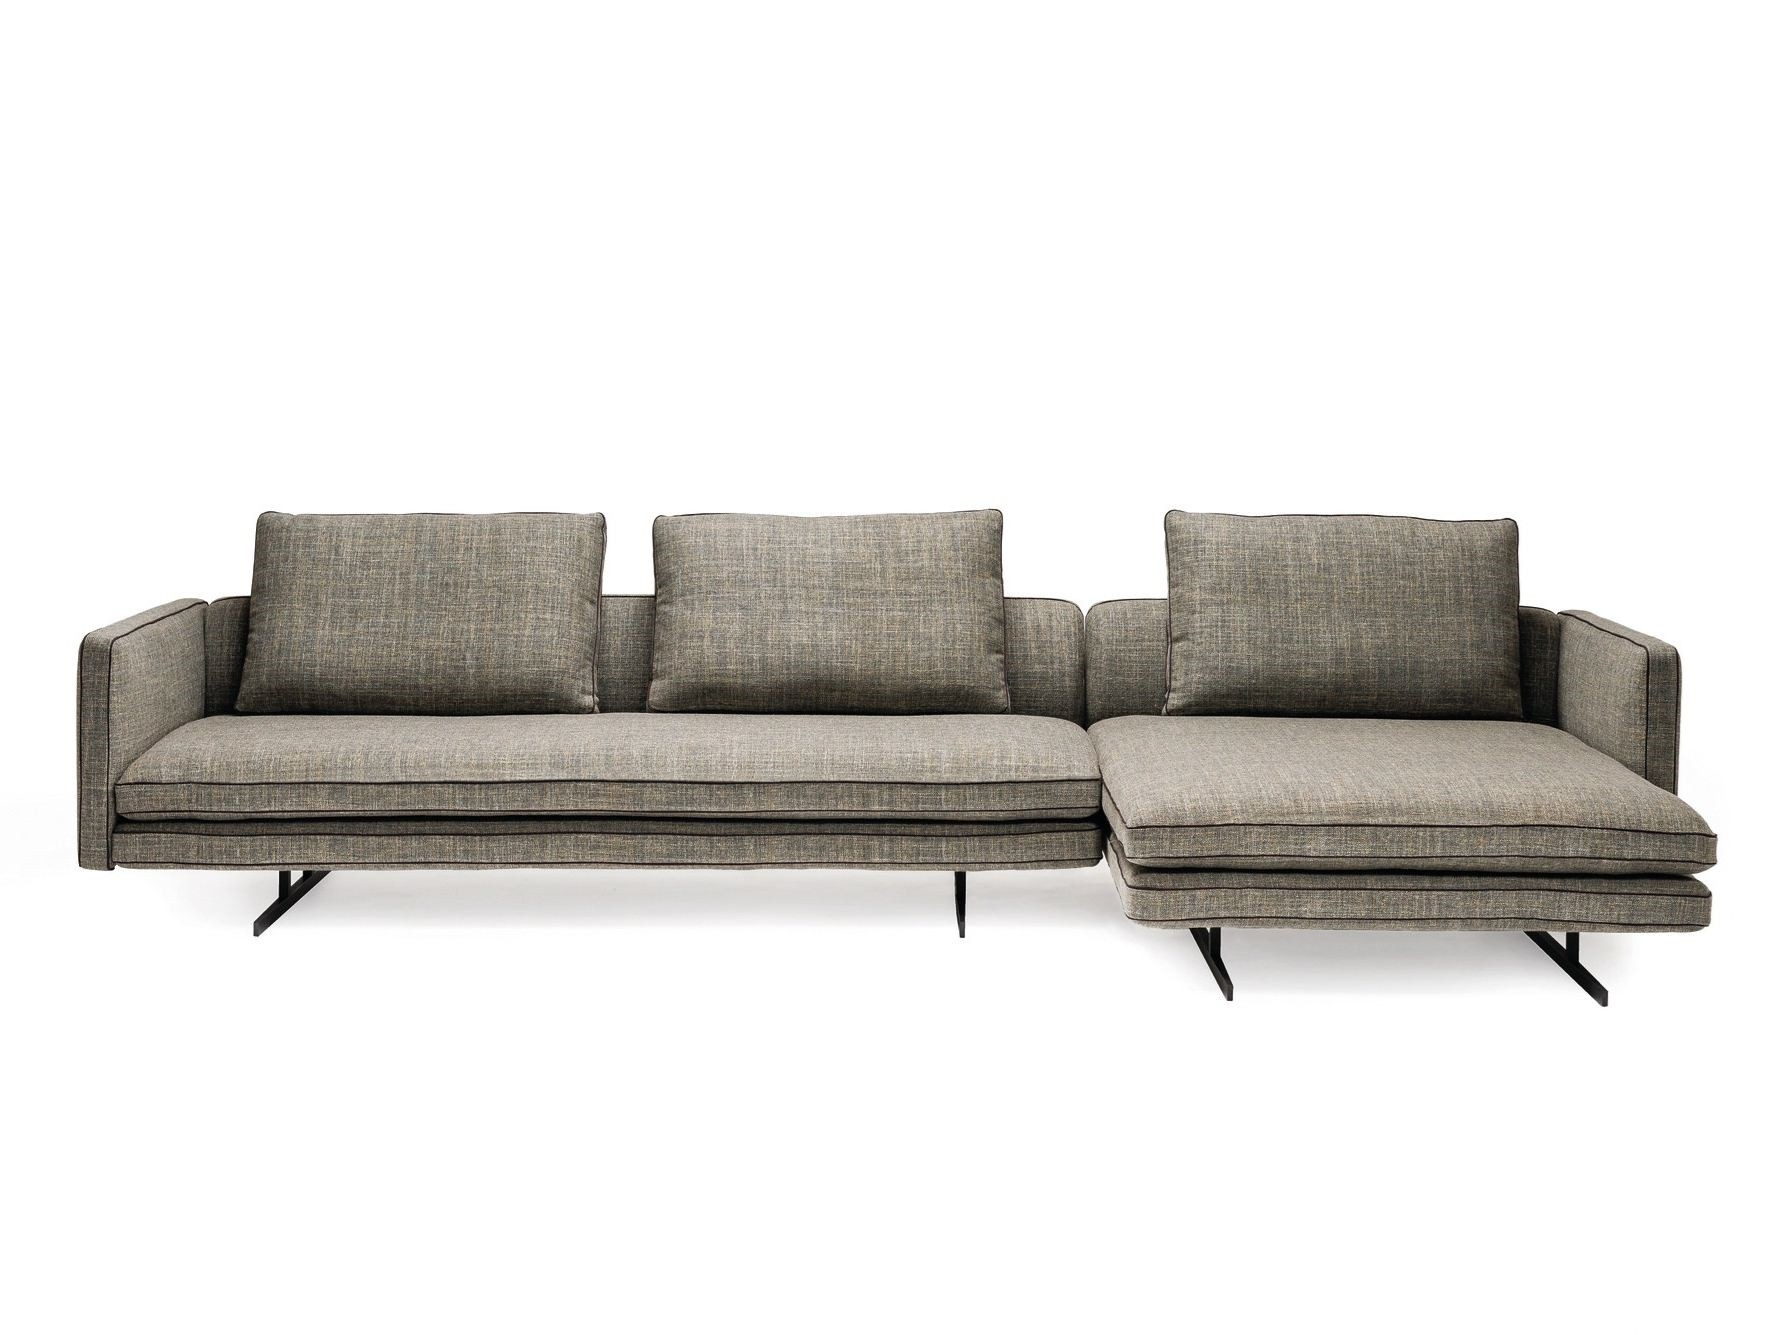 Moss hoekbank chaise longue arketipo puur design interieur